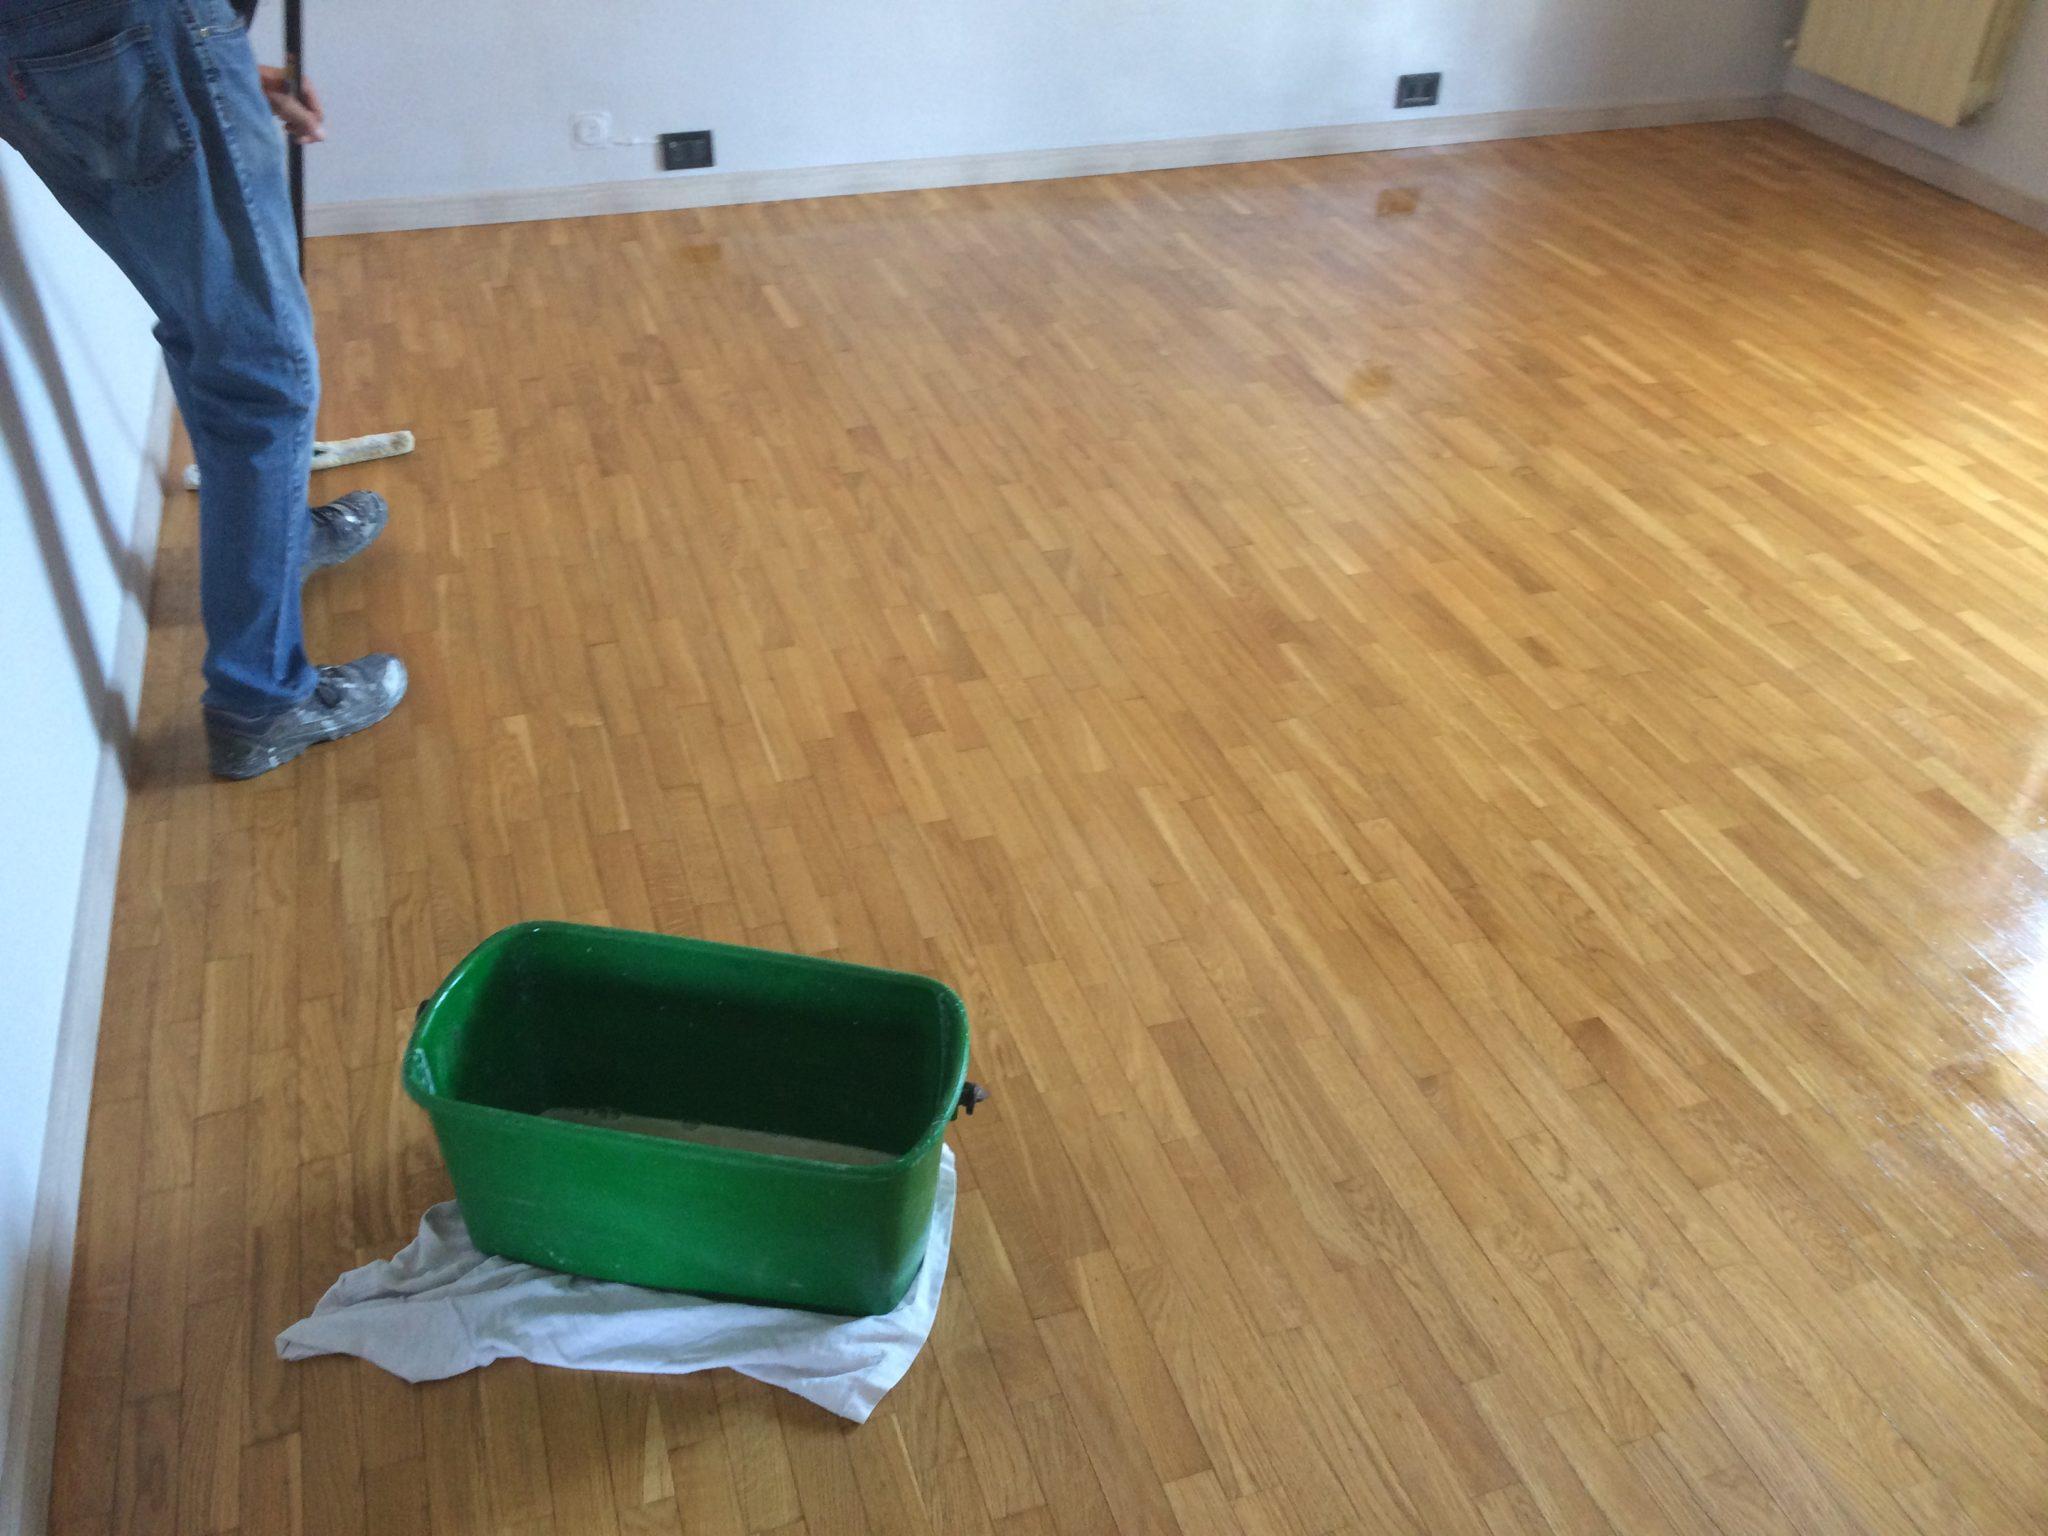 Lucidatura pavimenti in legno parquet senza levigare for Verniciare parquet senza levigare